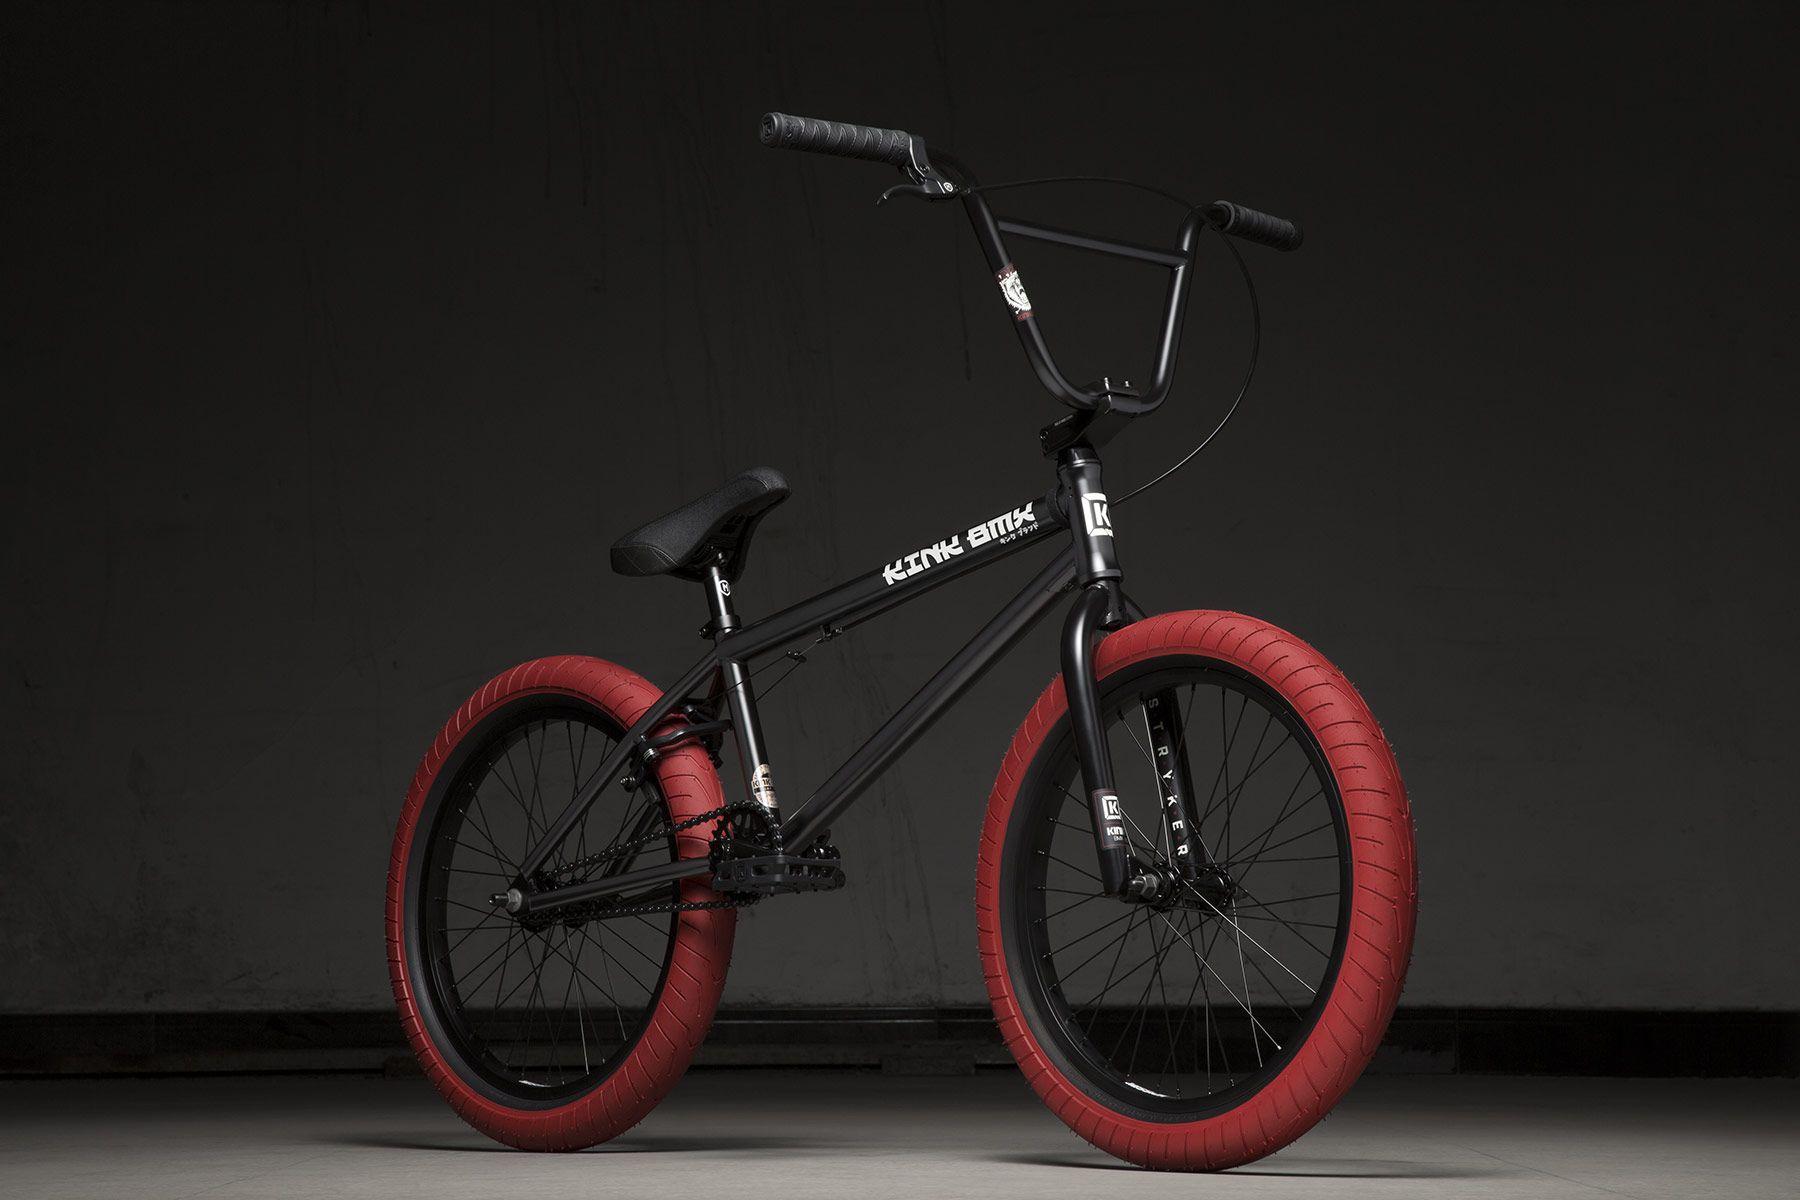 Pin On Kink Bmx Bike Company